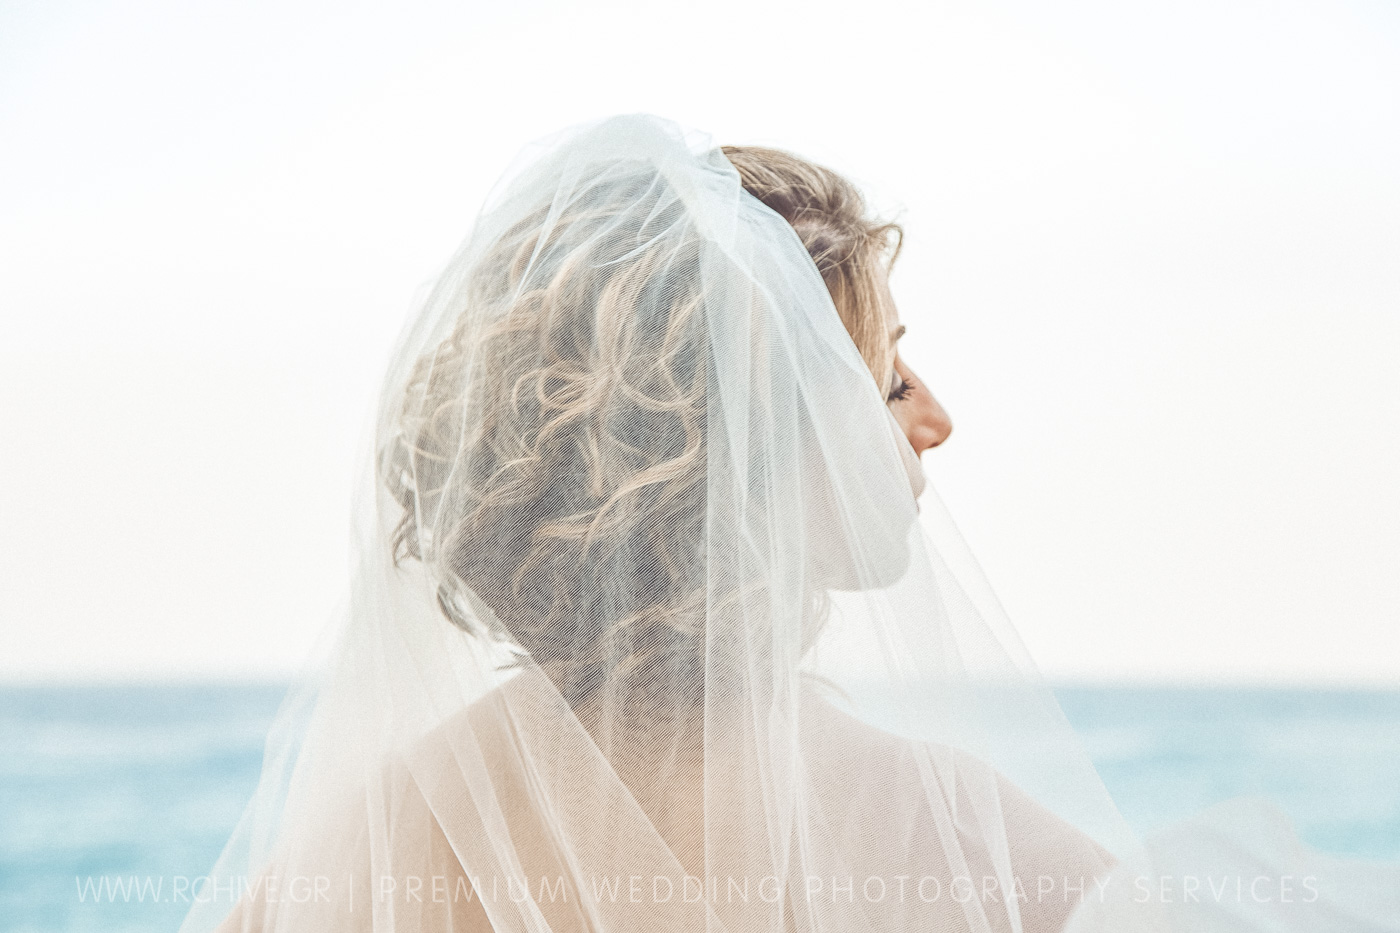 greek wedding photographers